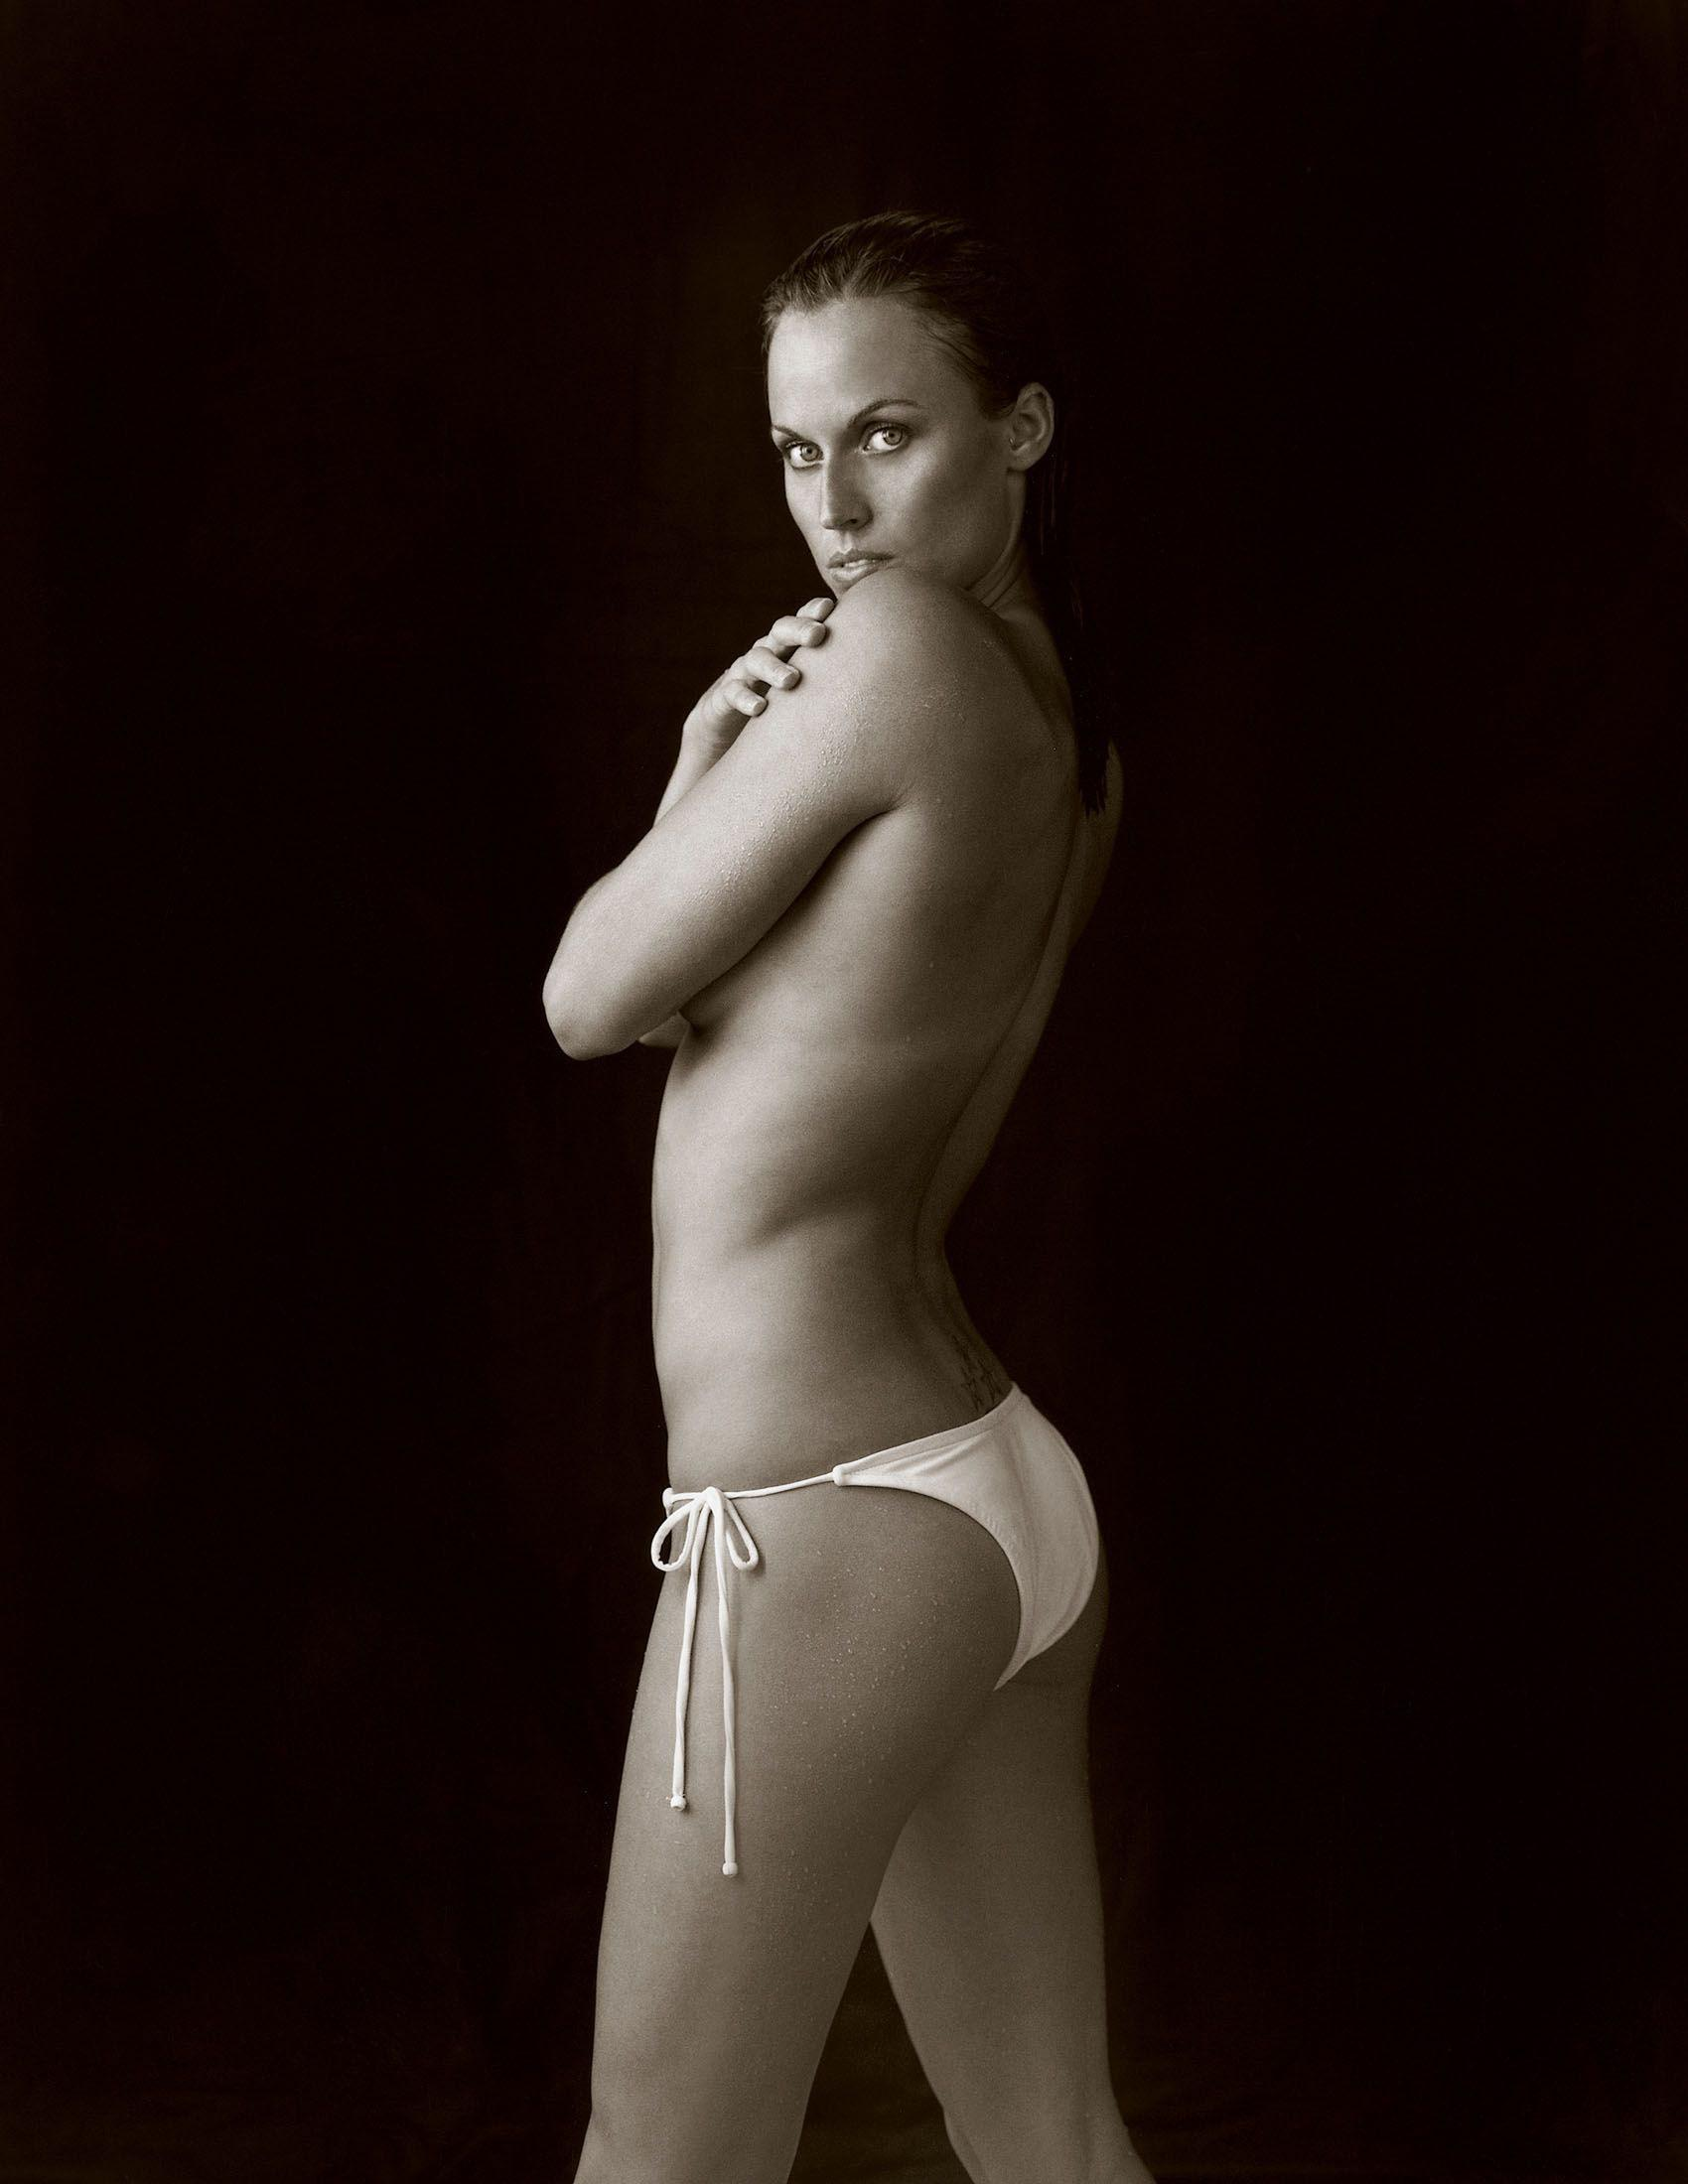 Jasmine Armfield Nude Photos and Videos new foto